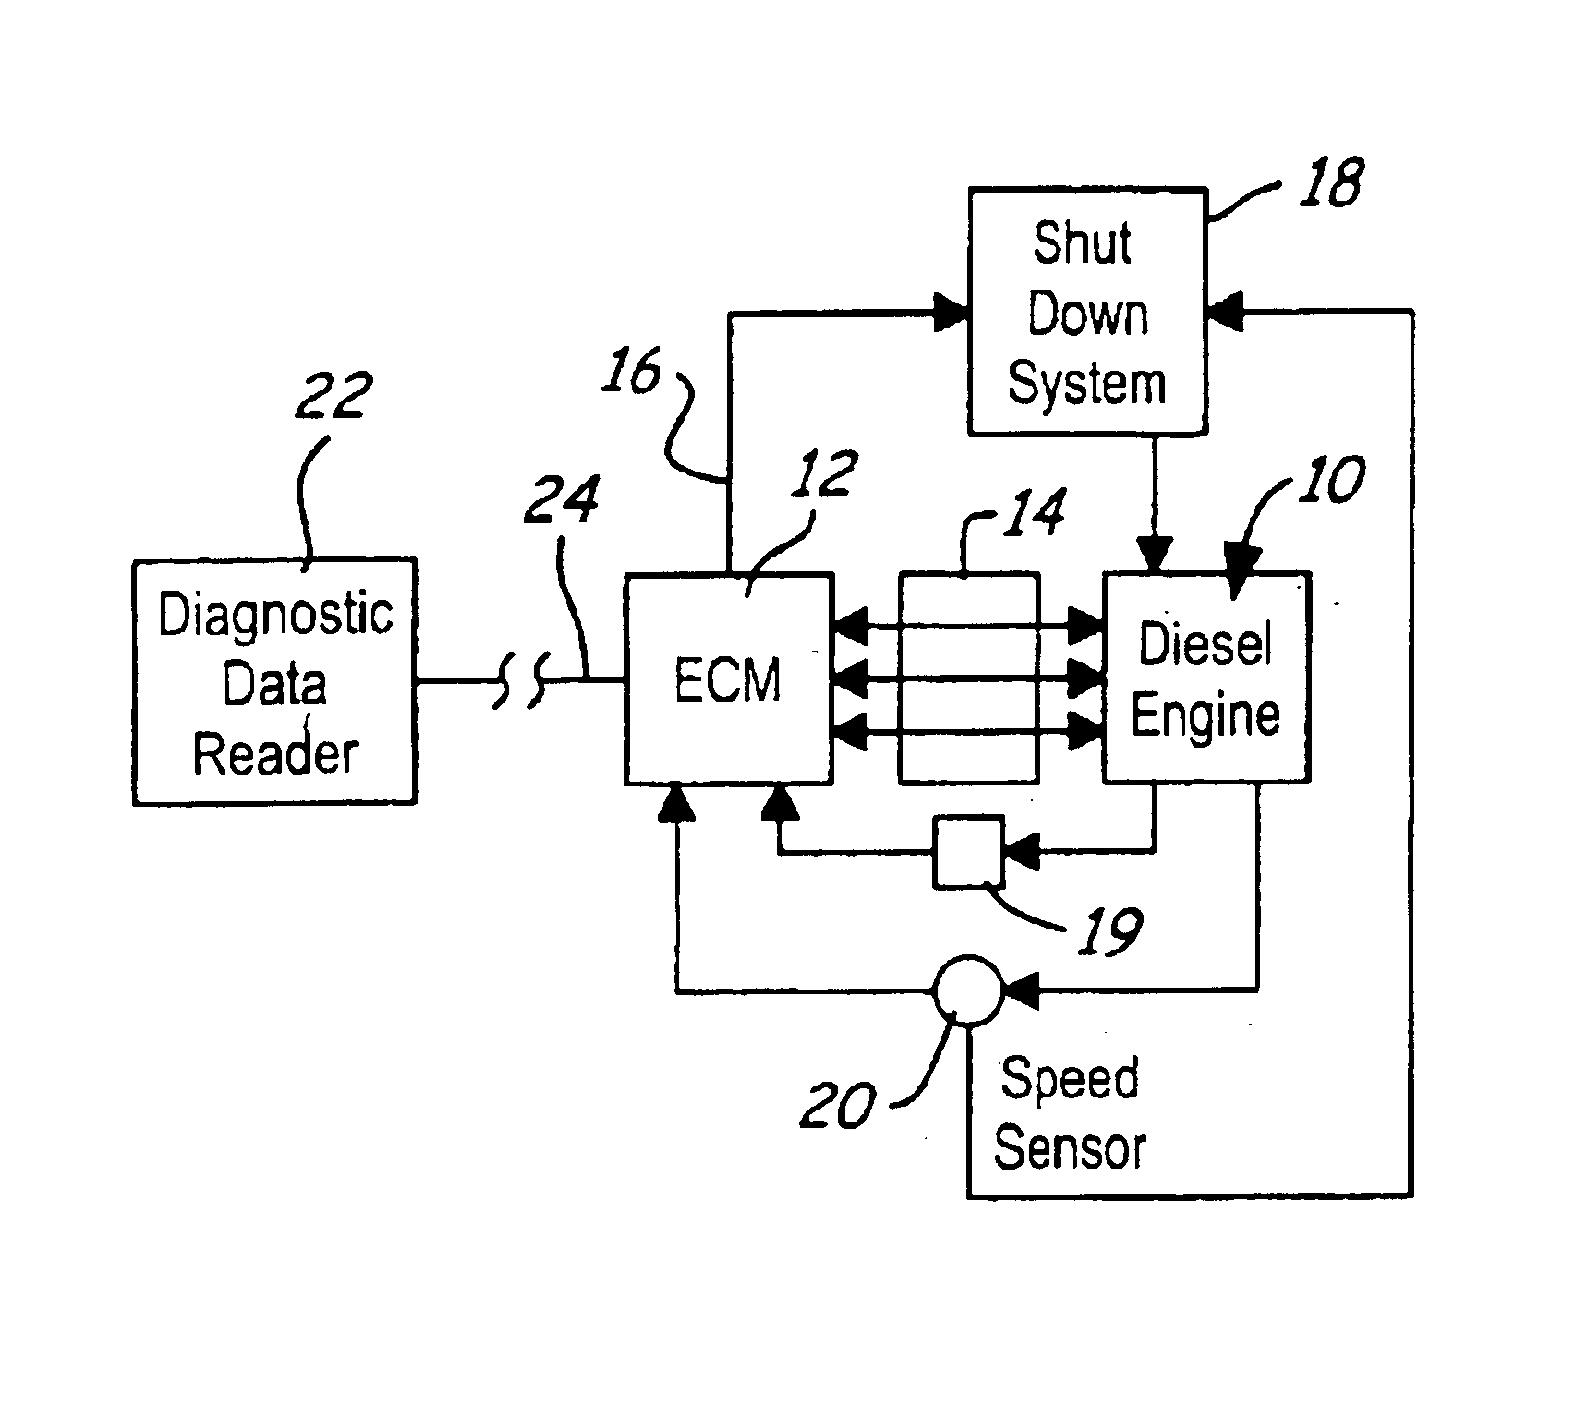 Vactor 2100 Wiring Diagram : 26 Wiring Diagram Images